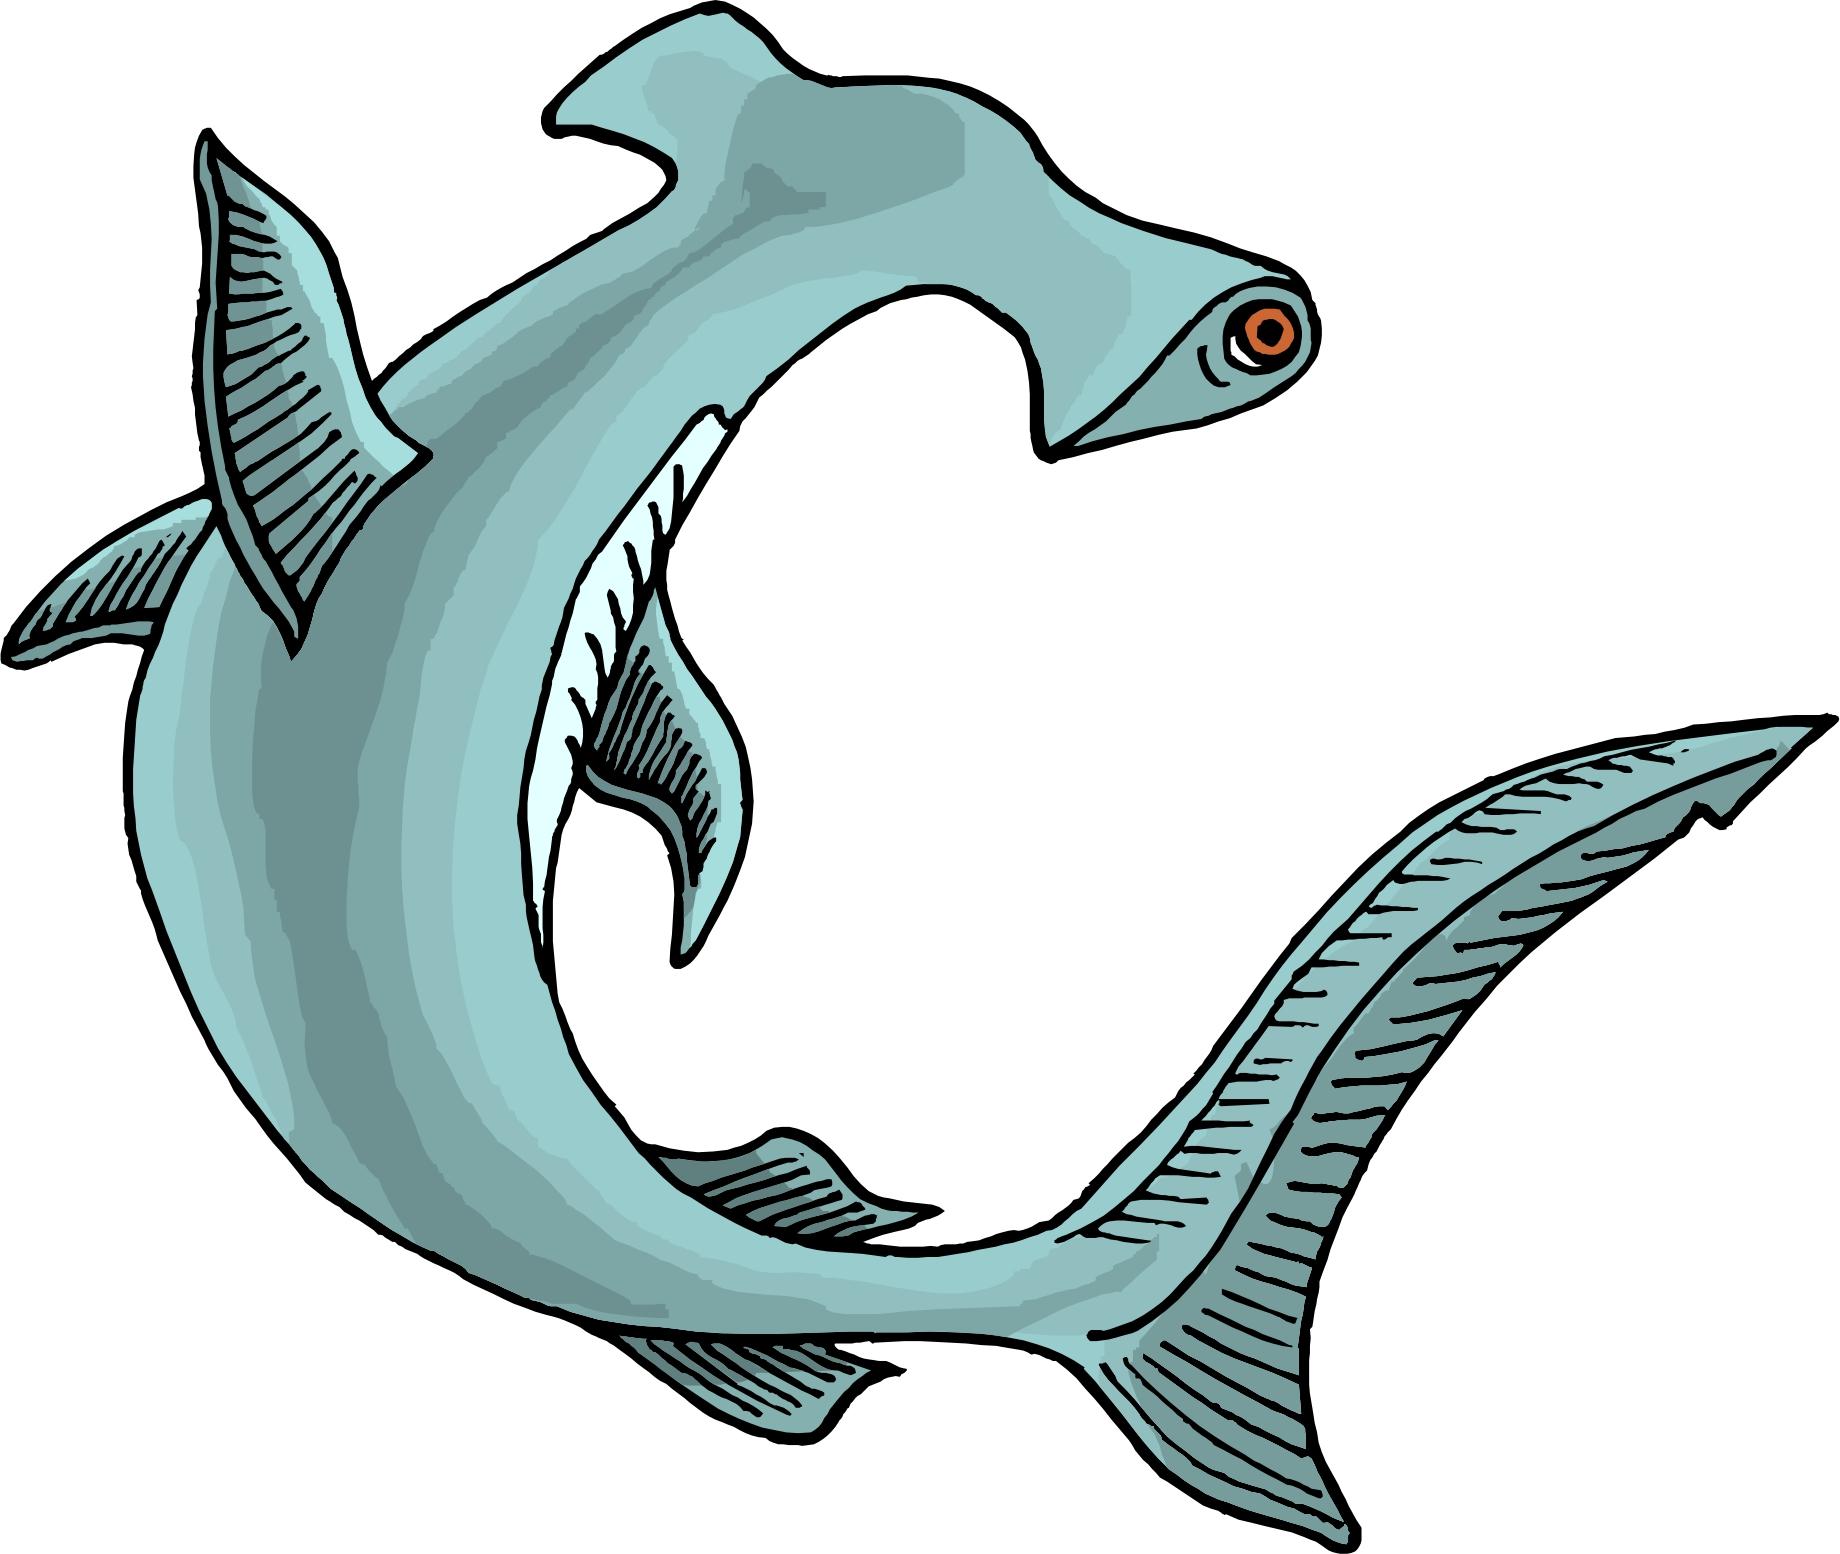 Hammerhead Shark Clipart Black And White-hammerhead shark clipart black and white-12